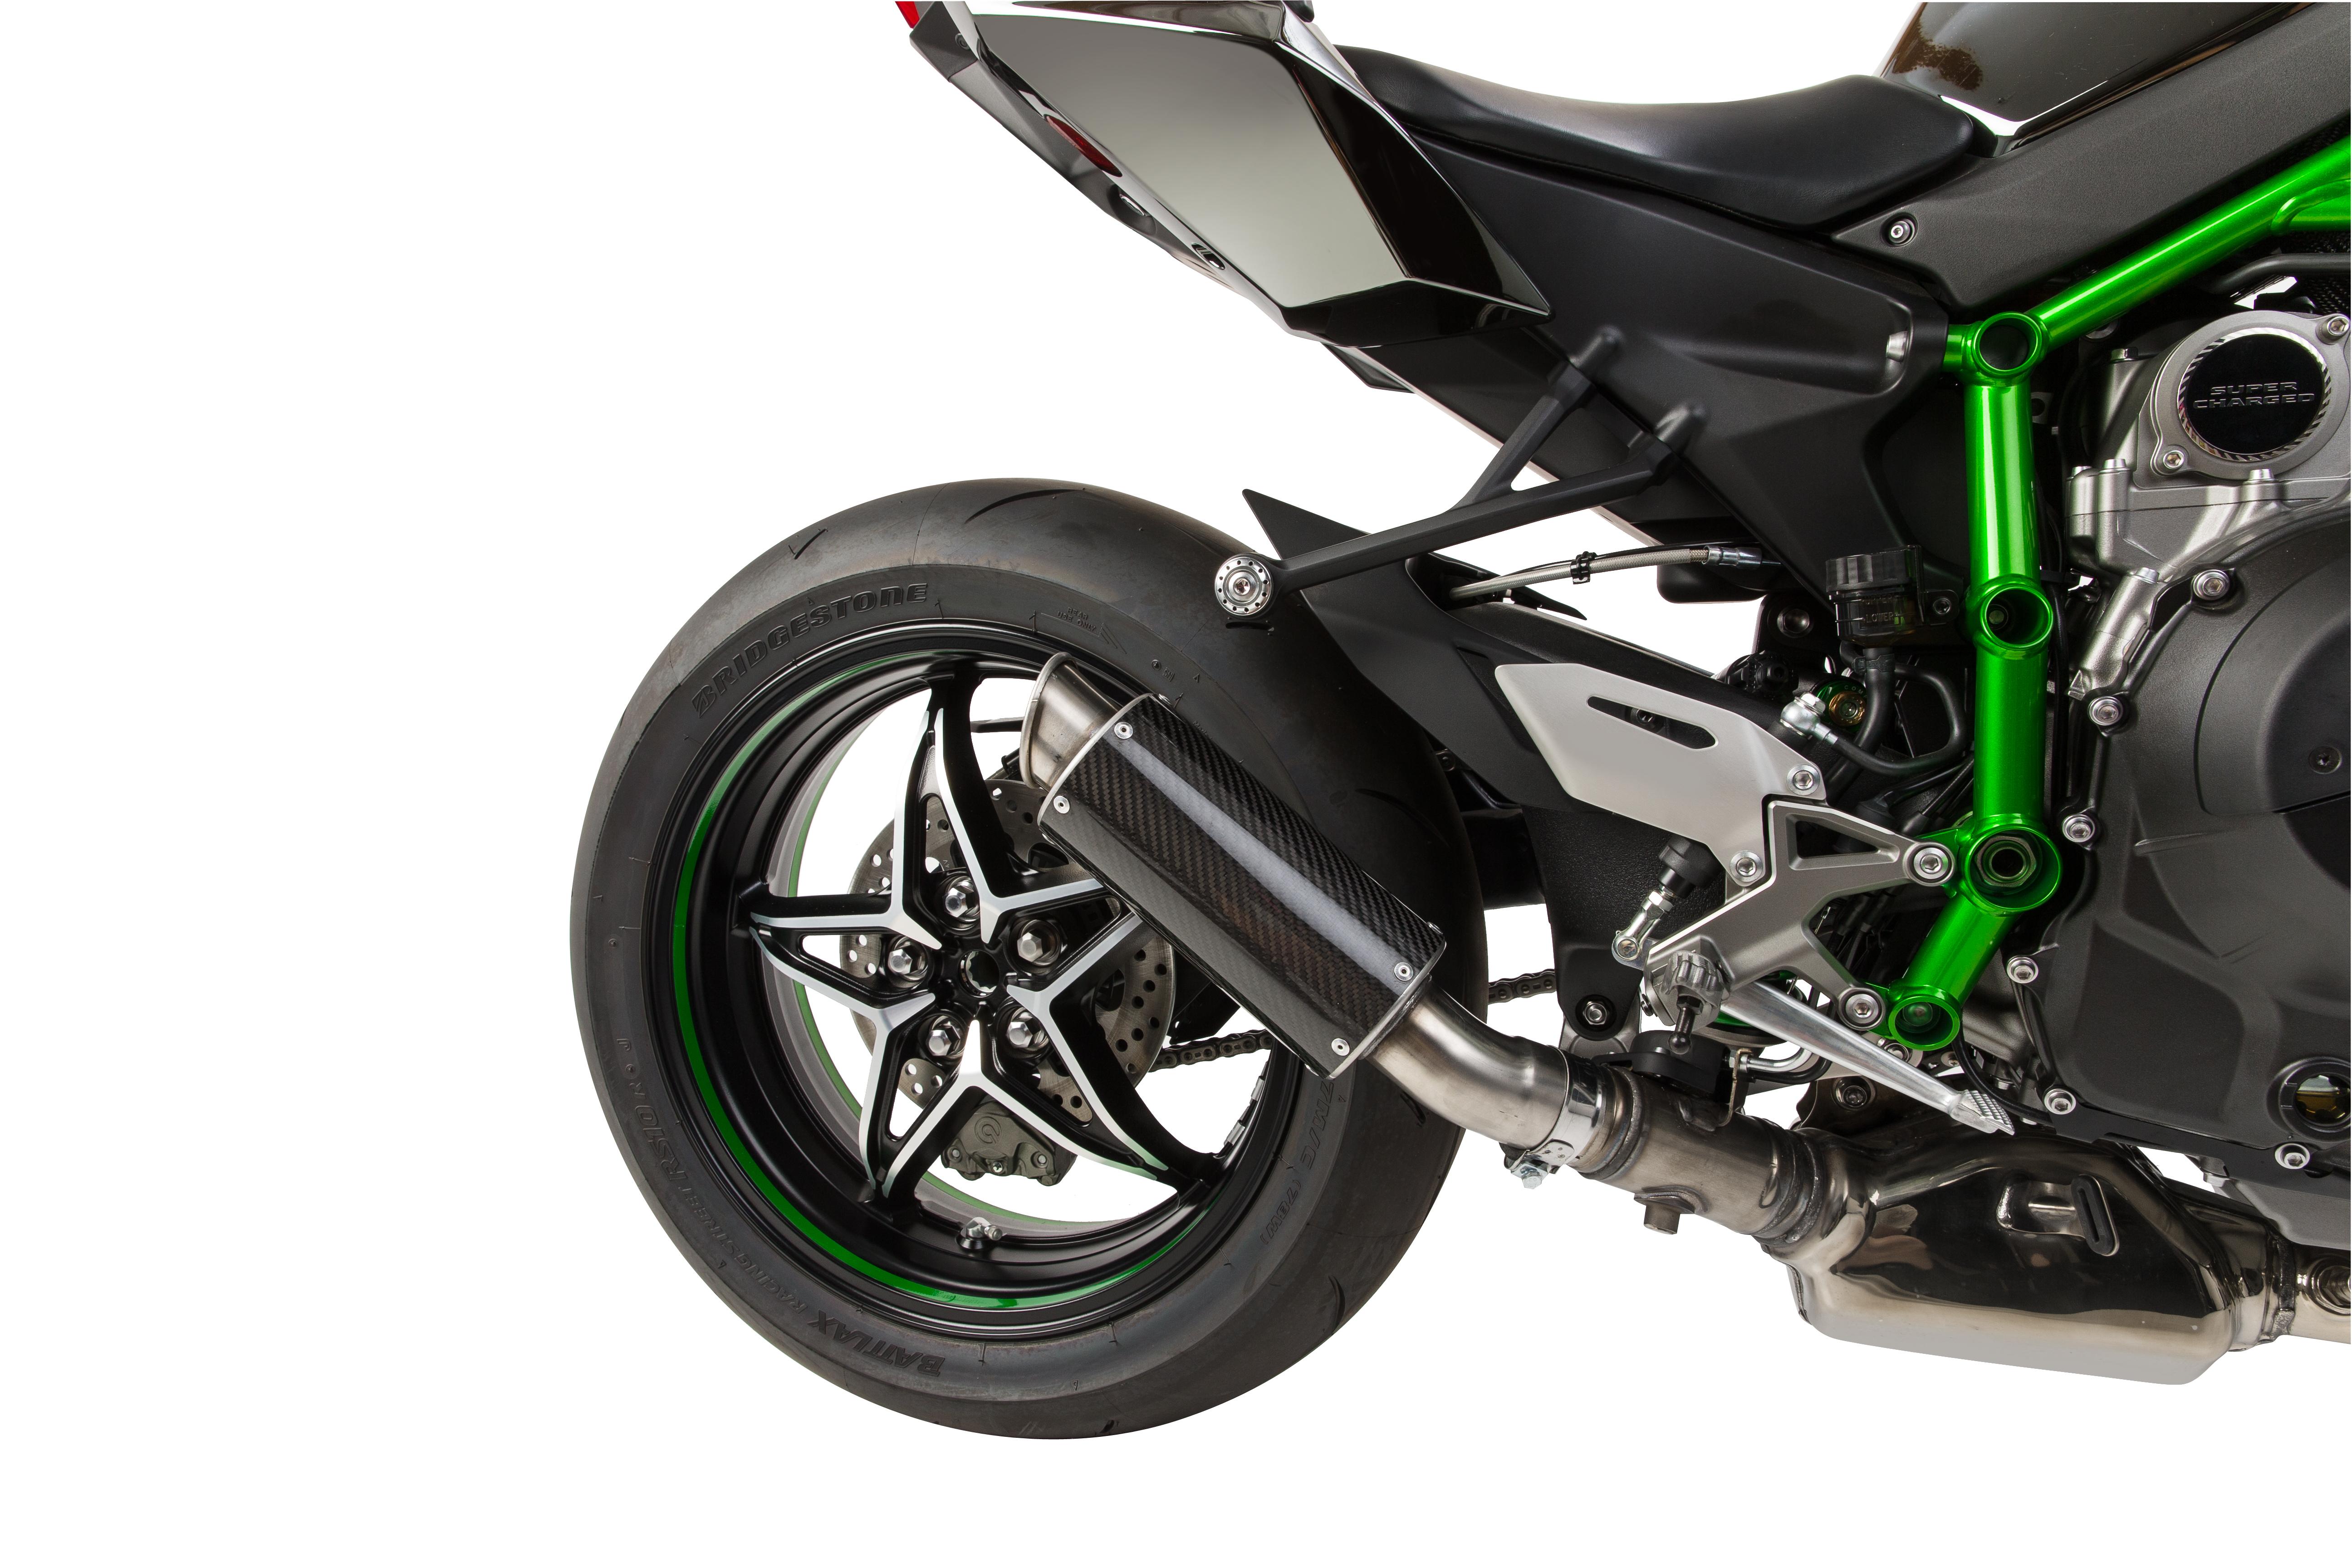 Hotbodies MGP Exhaust Slip On Carbon Fiber Canister 2015 Kawasaki Ninja H2